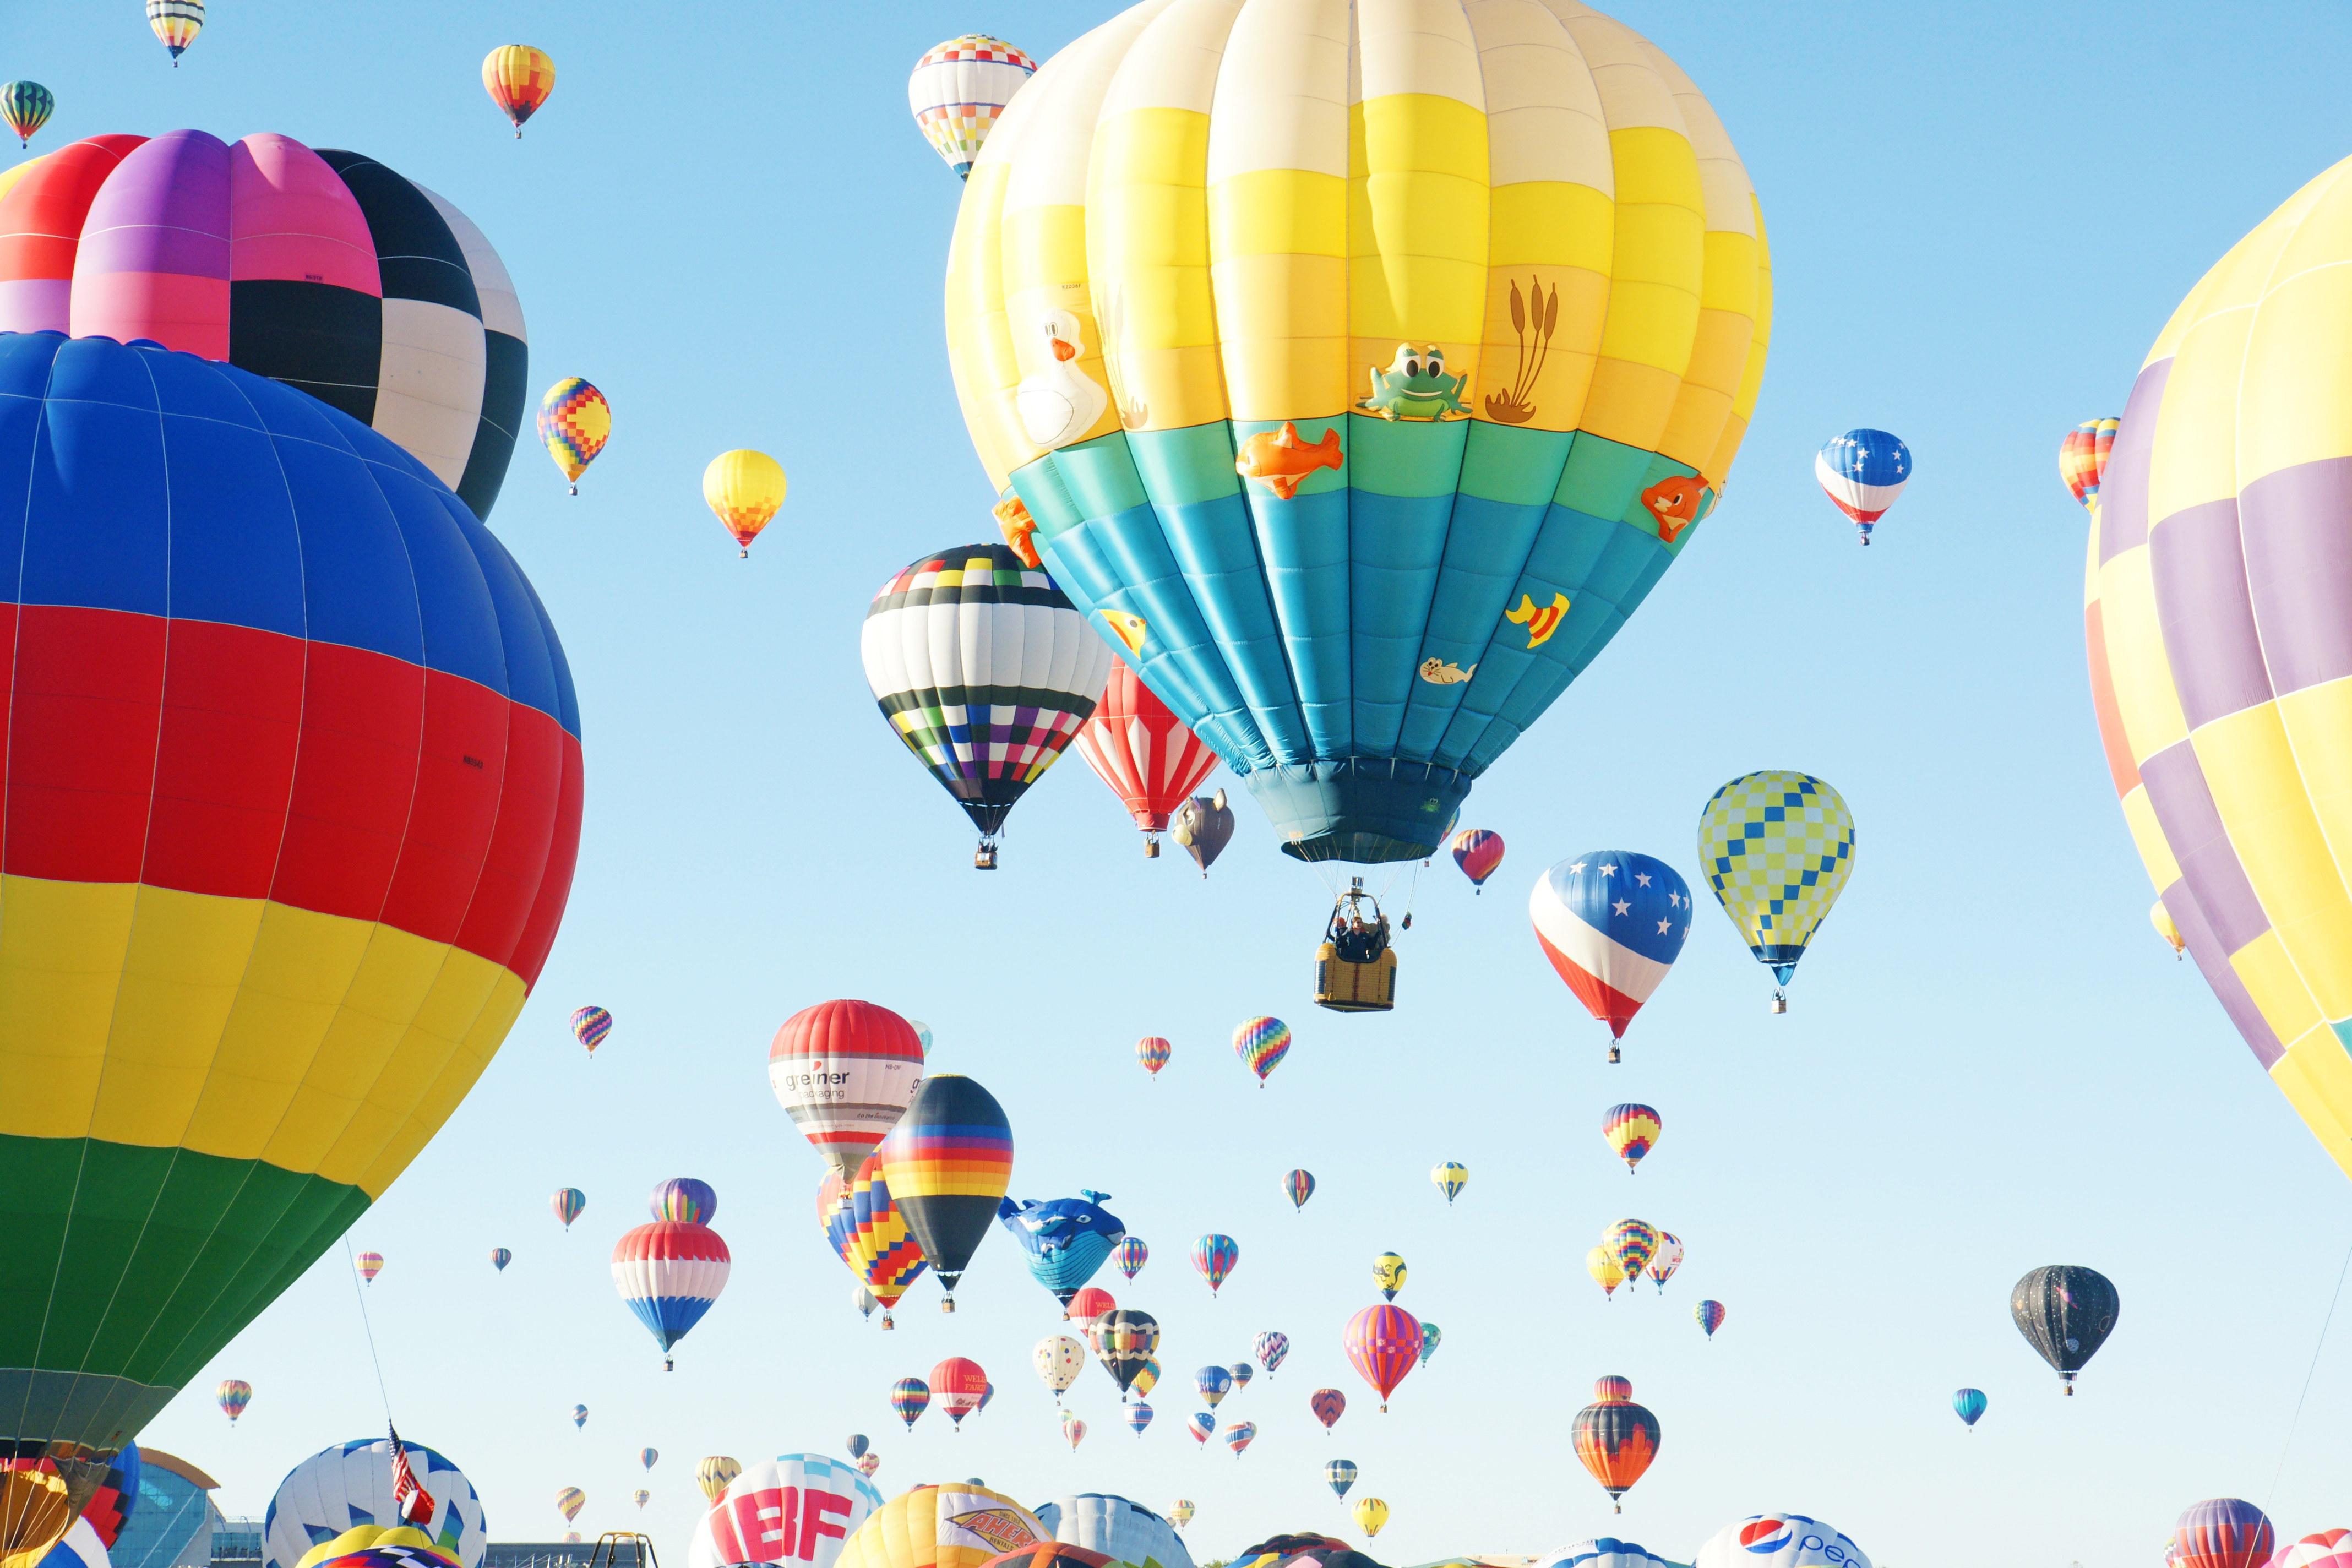 Albuquerque International Balloon Fiesta – Part 1